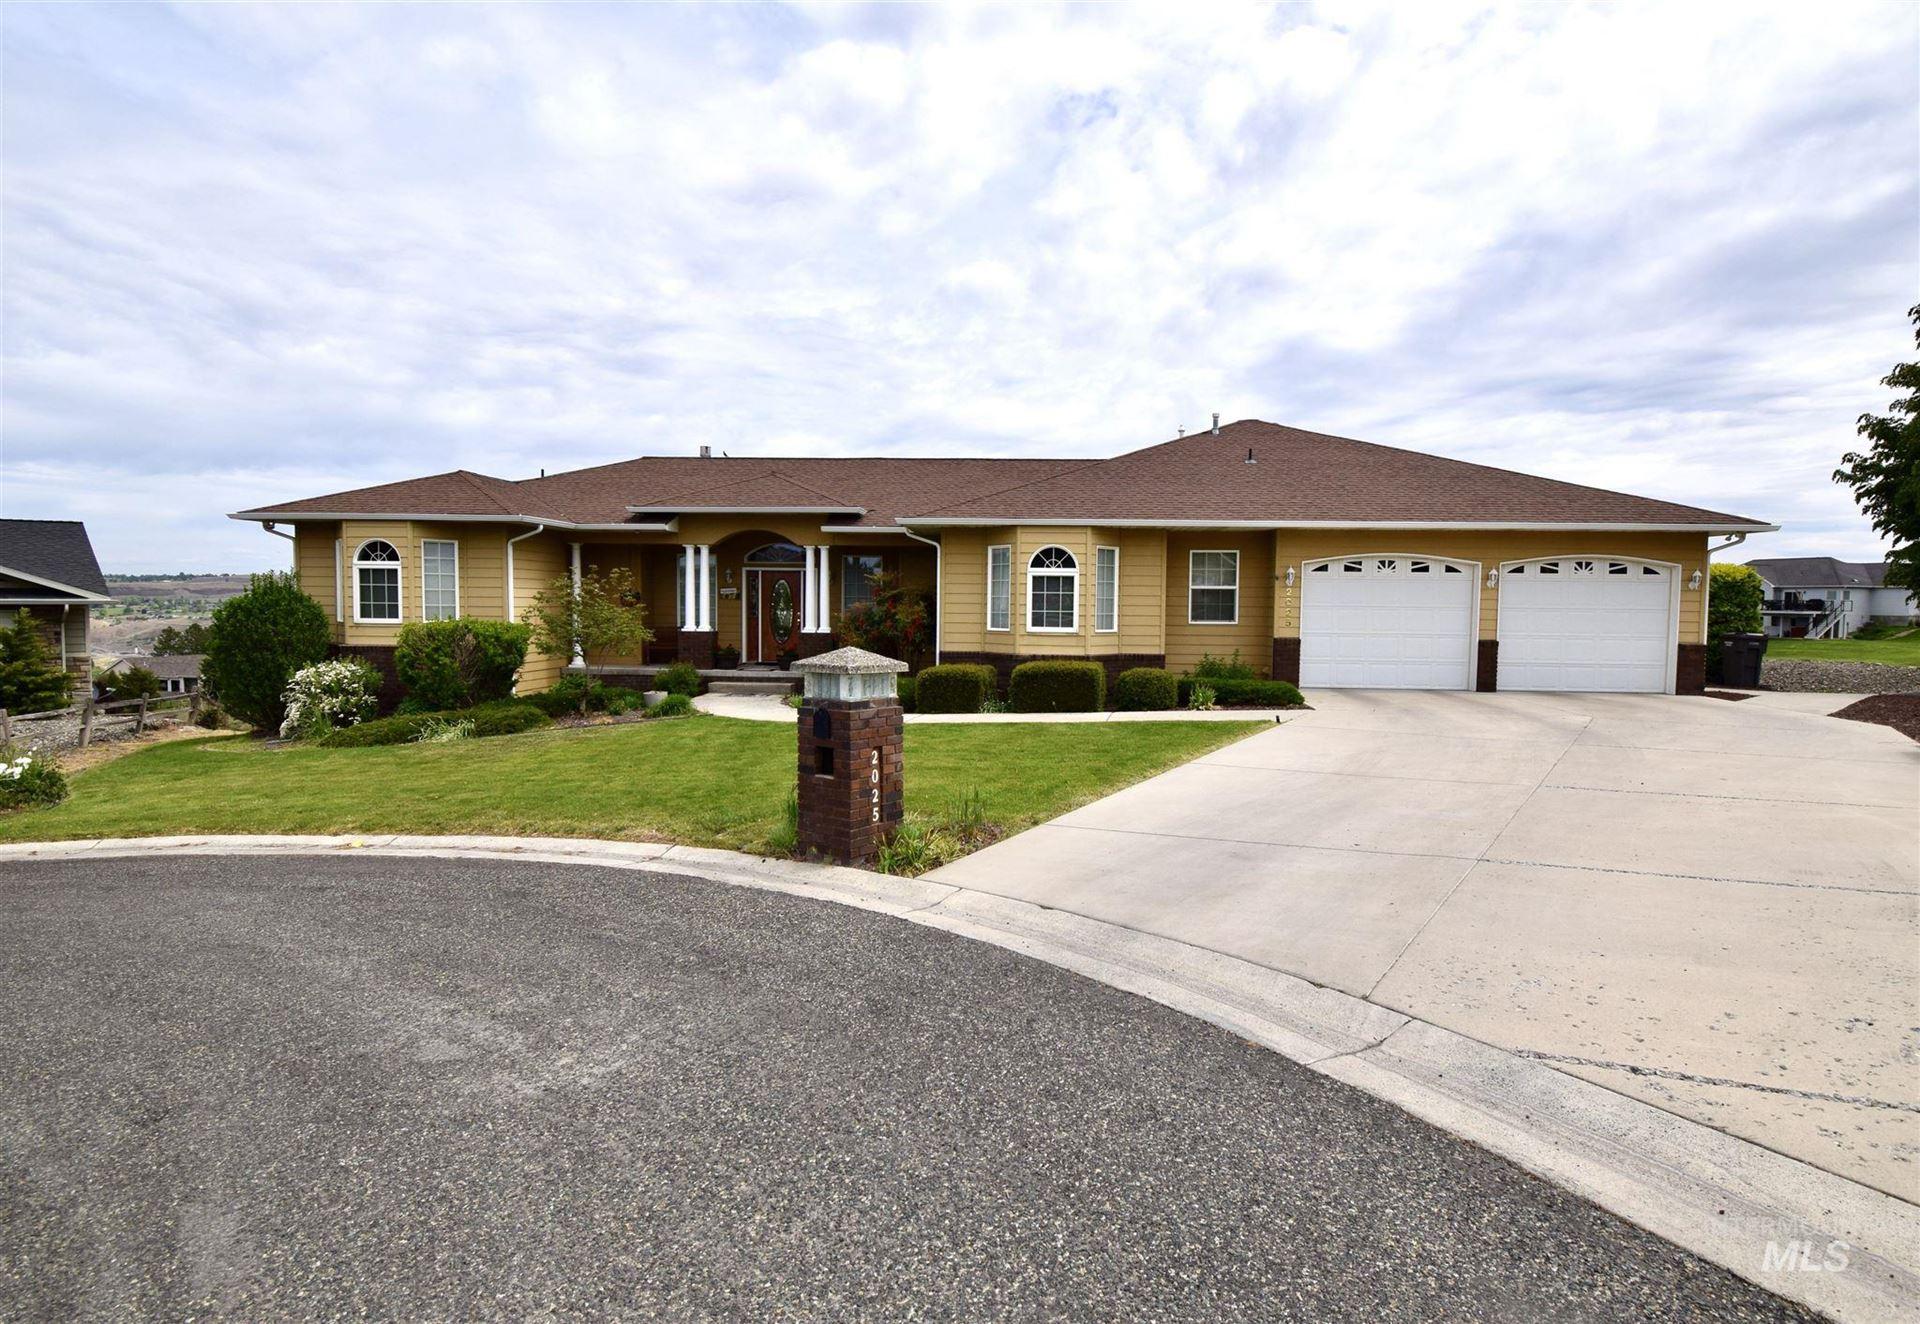 2025 Pleasant View Court, Clarkston, WA 99403 - MLS#: 98803602